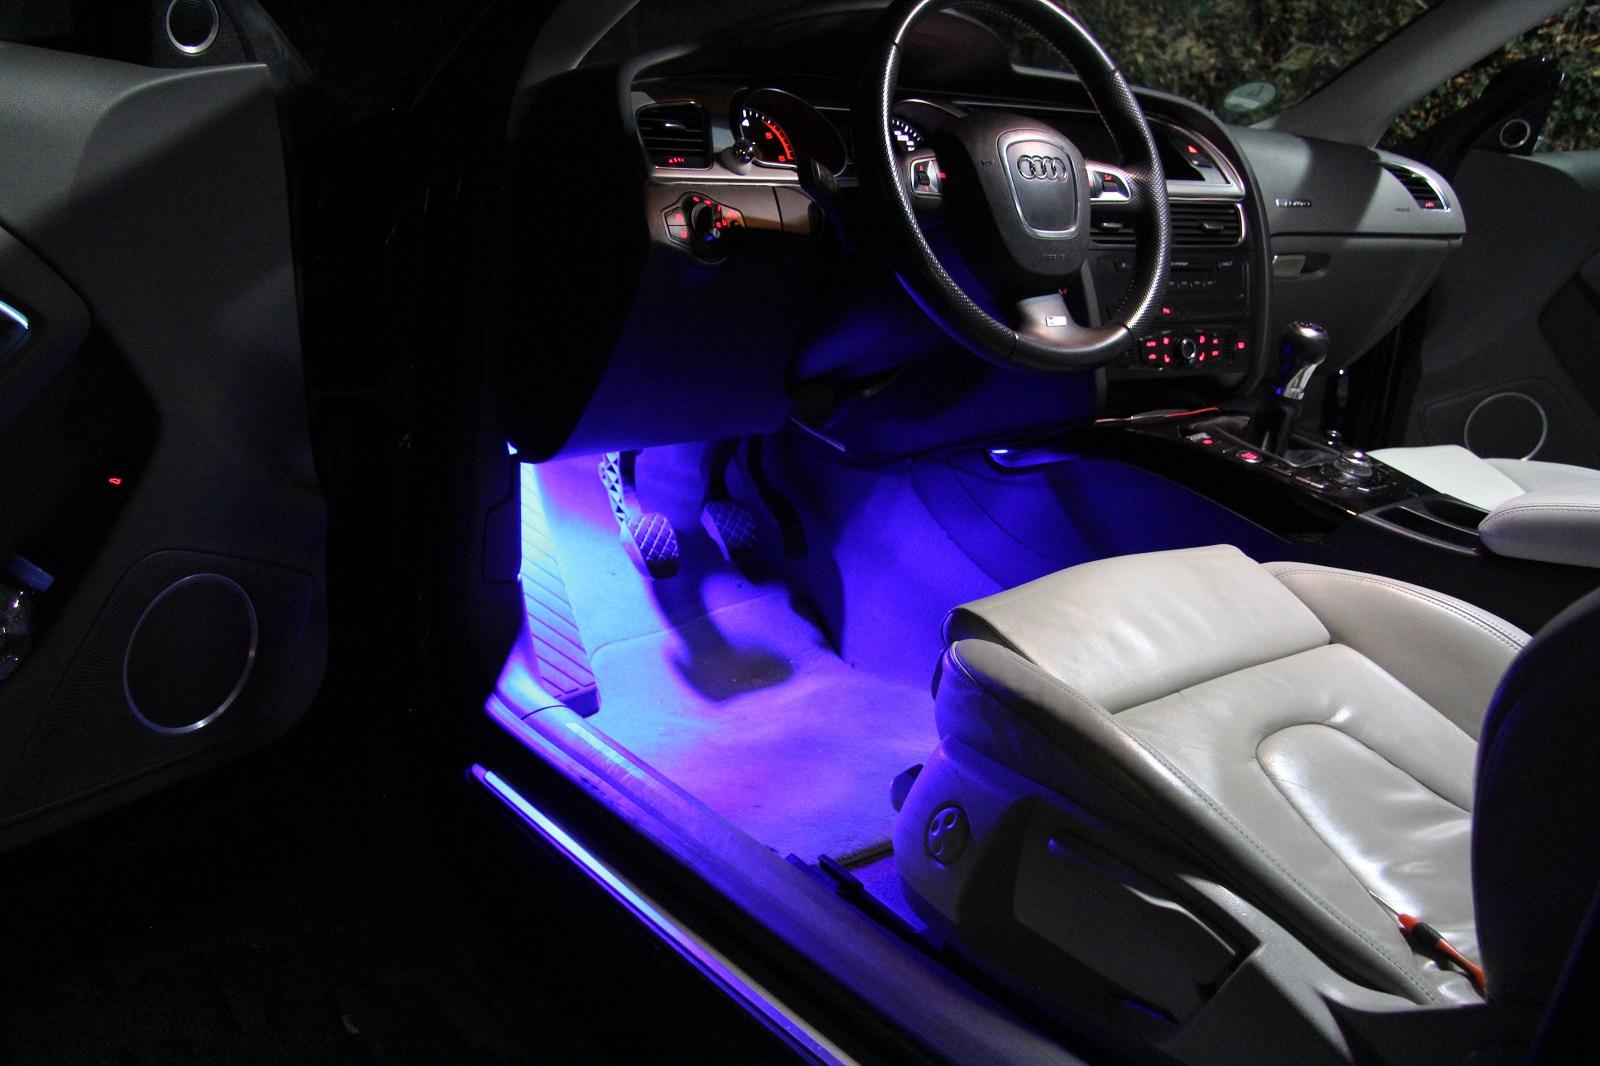 6x5050 smd led modulplatine fussraumbeleuchtung blau f r vw multivan 6 t6 ebay. Black Bedroom Furniture Sets. Home Design Ideas